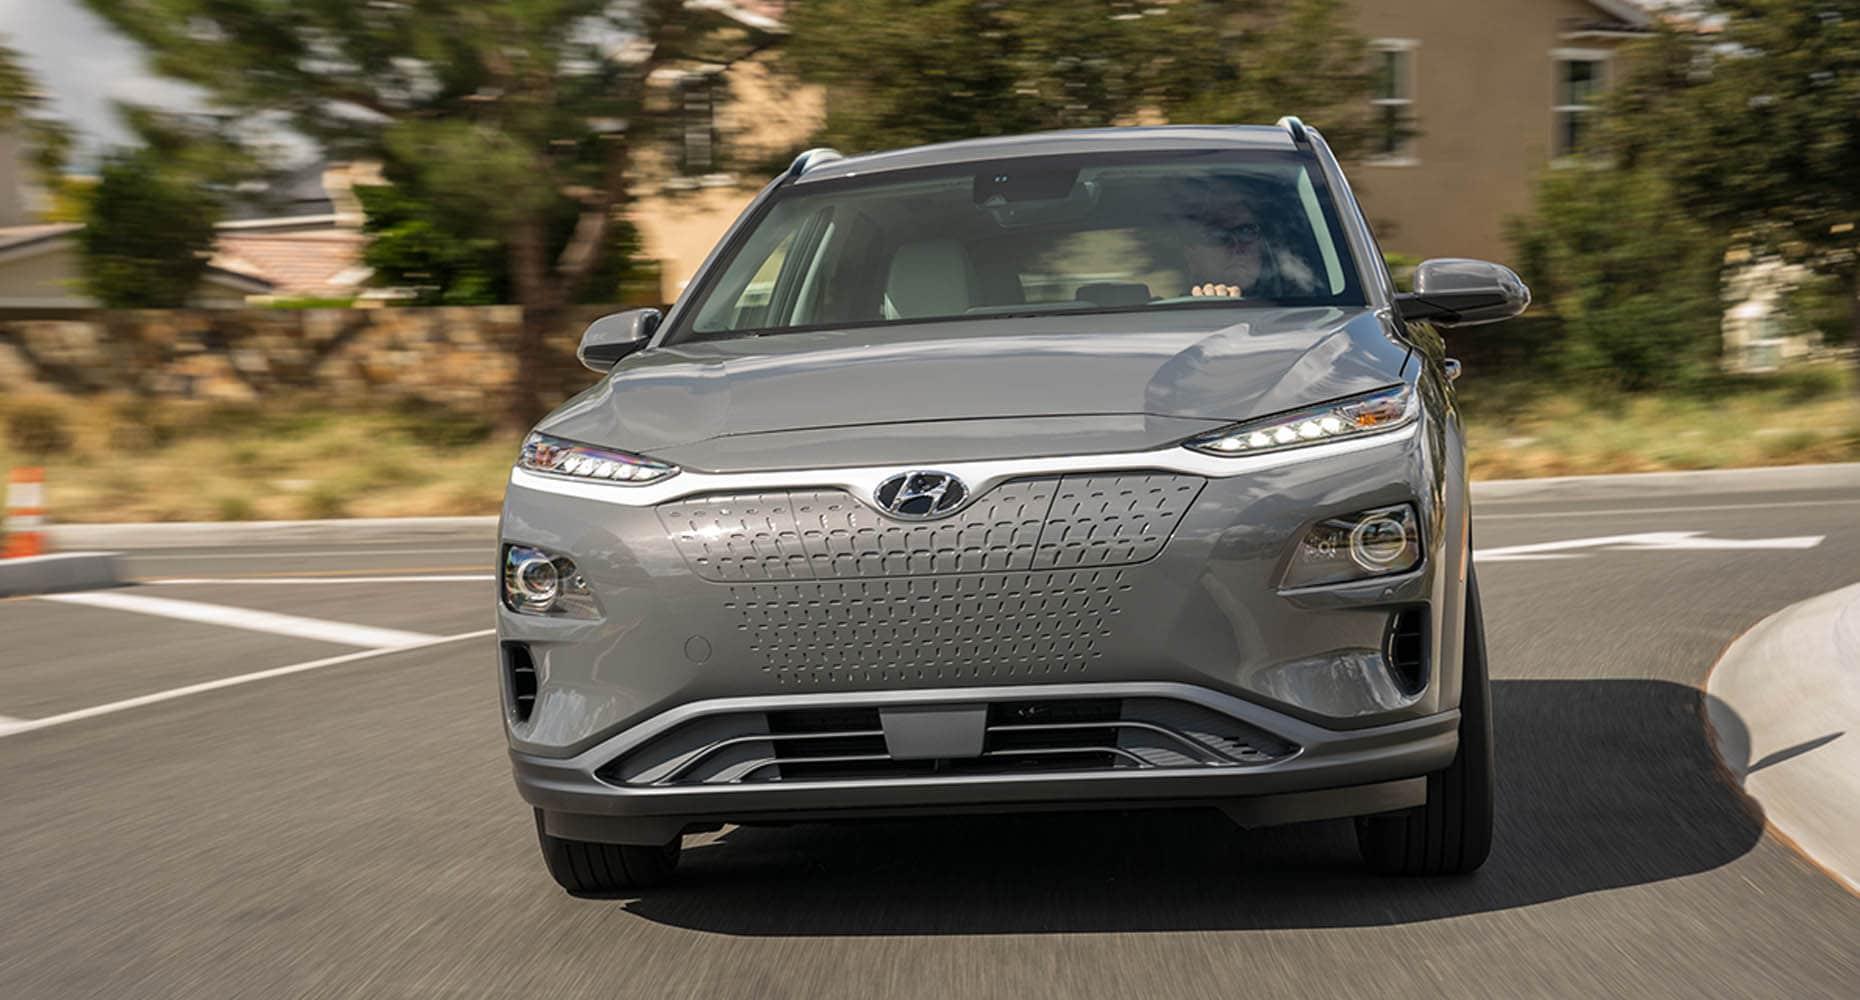 2020 Hyundai Kona Electric Hyundai Canada